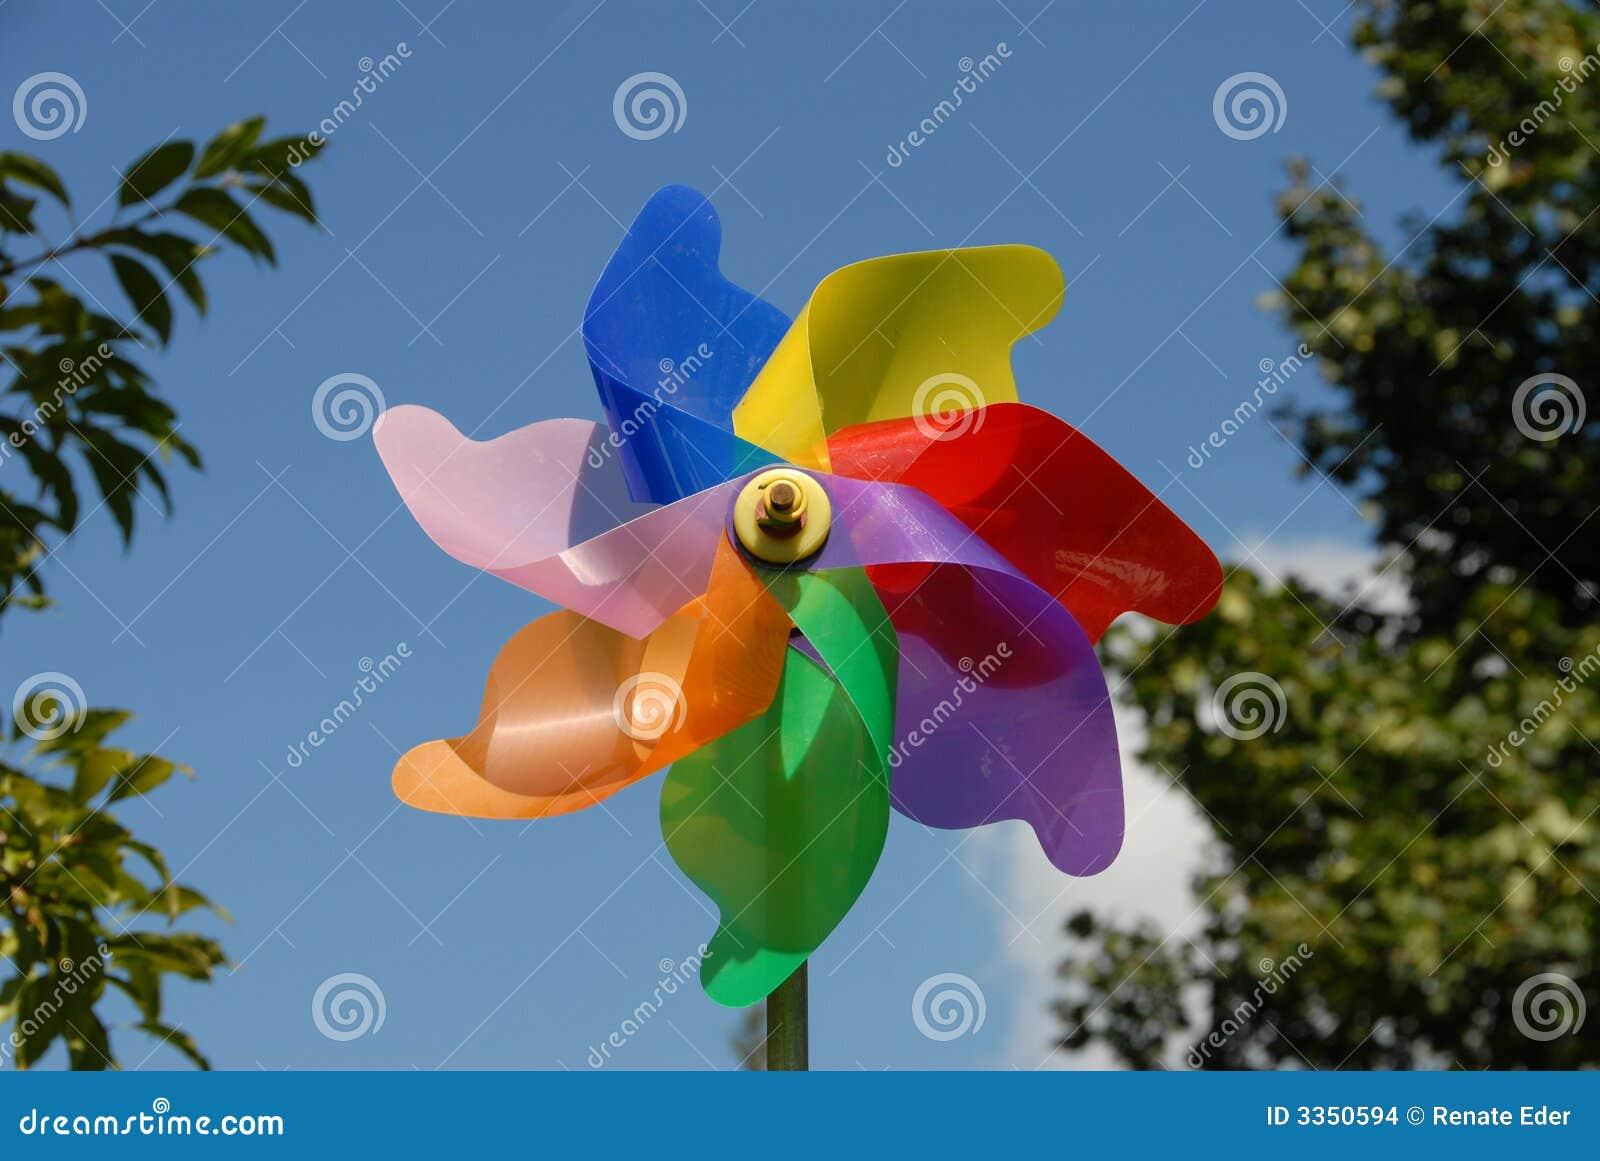 Moinho de vento colorido